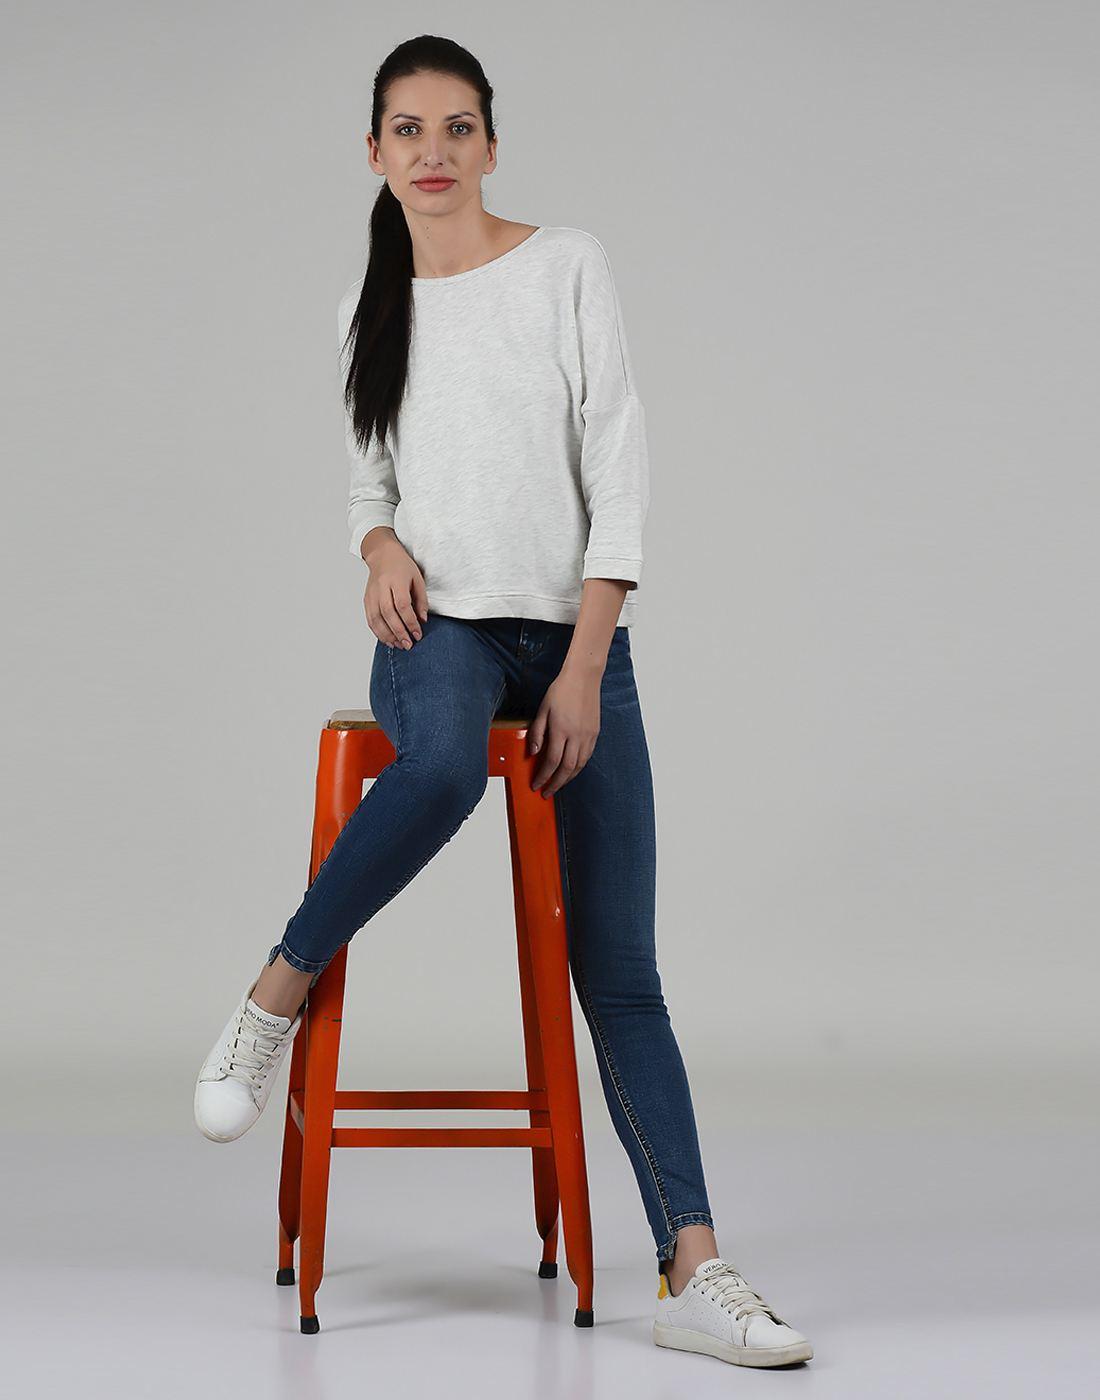 Only Women Casual Blue Jean